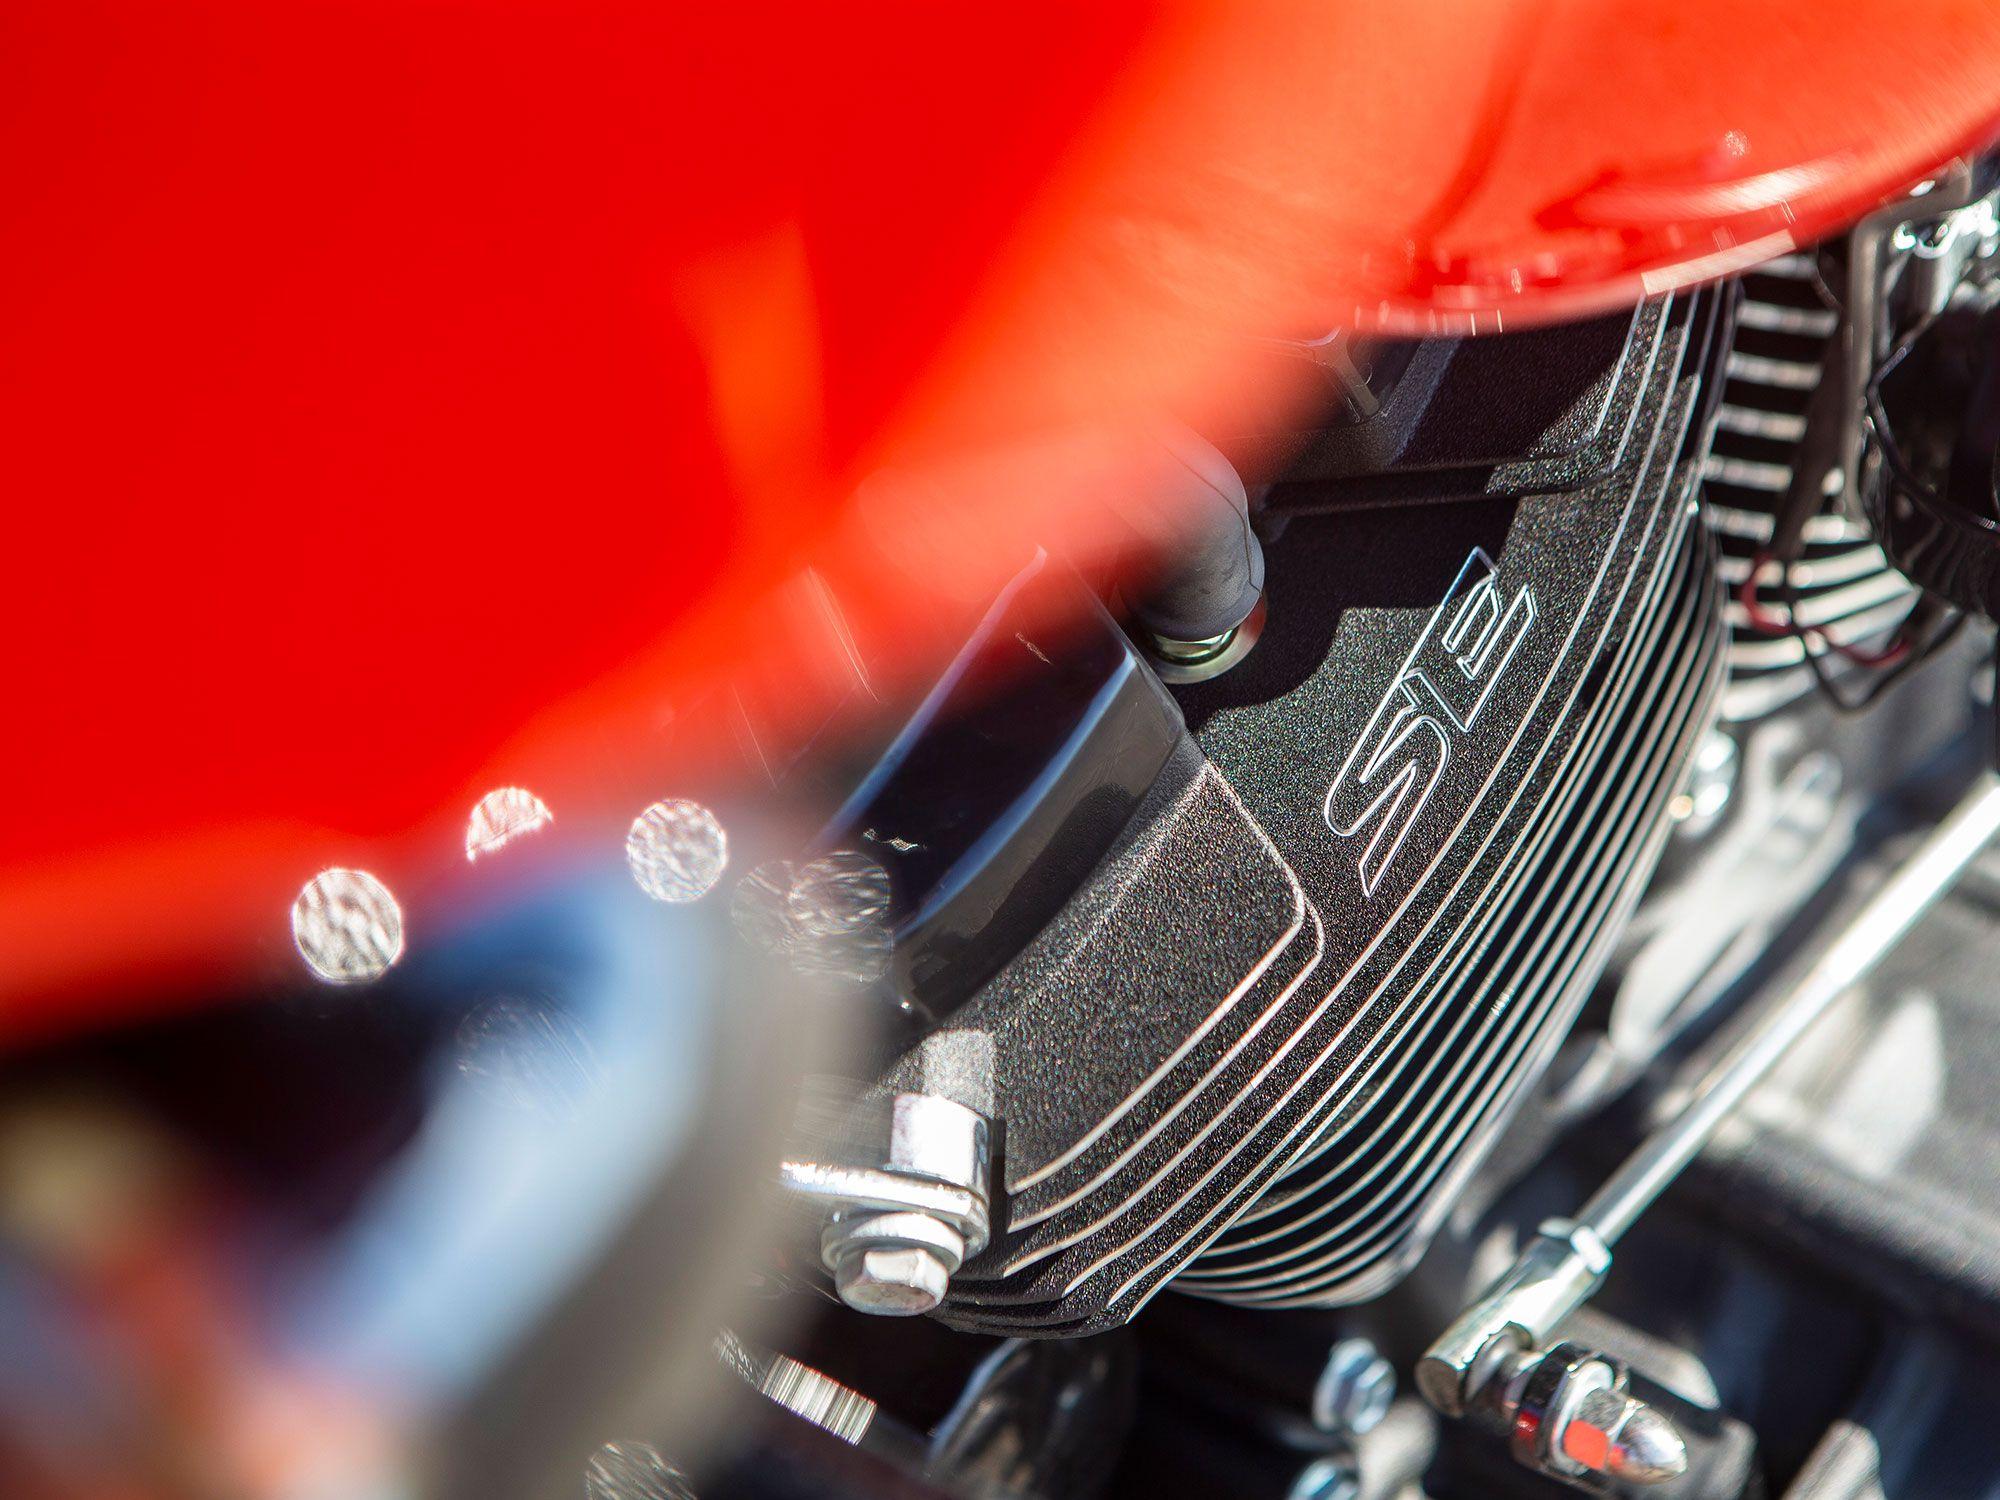 """SE,"" for Screamin' Eagle, adorns a cooling fin of each cylinder."